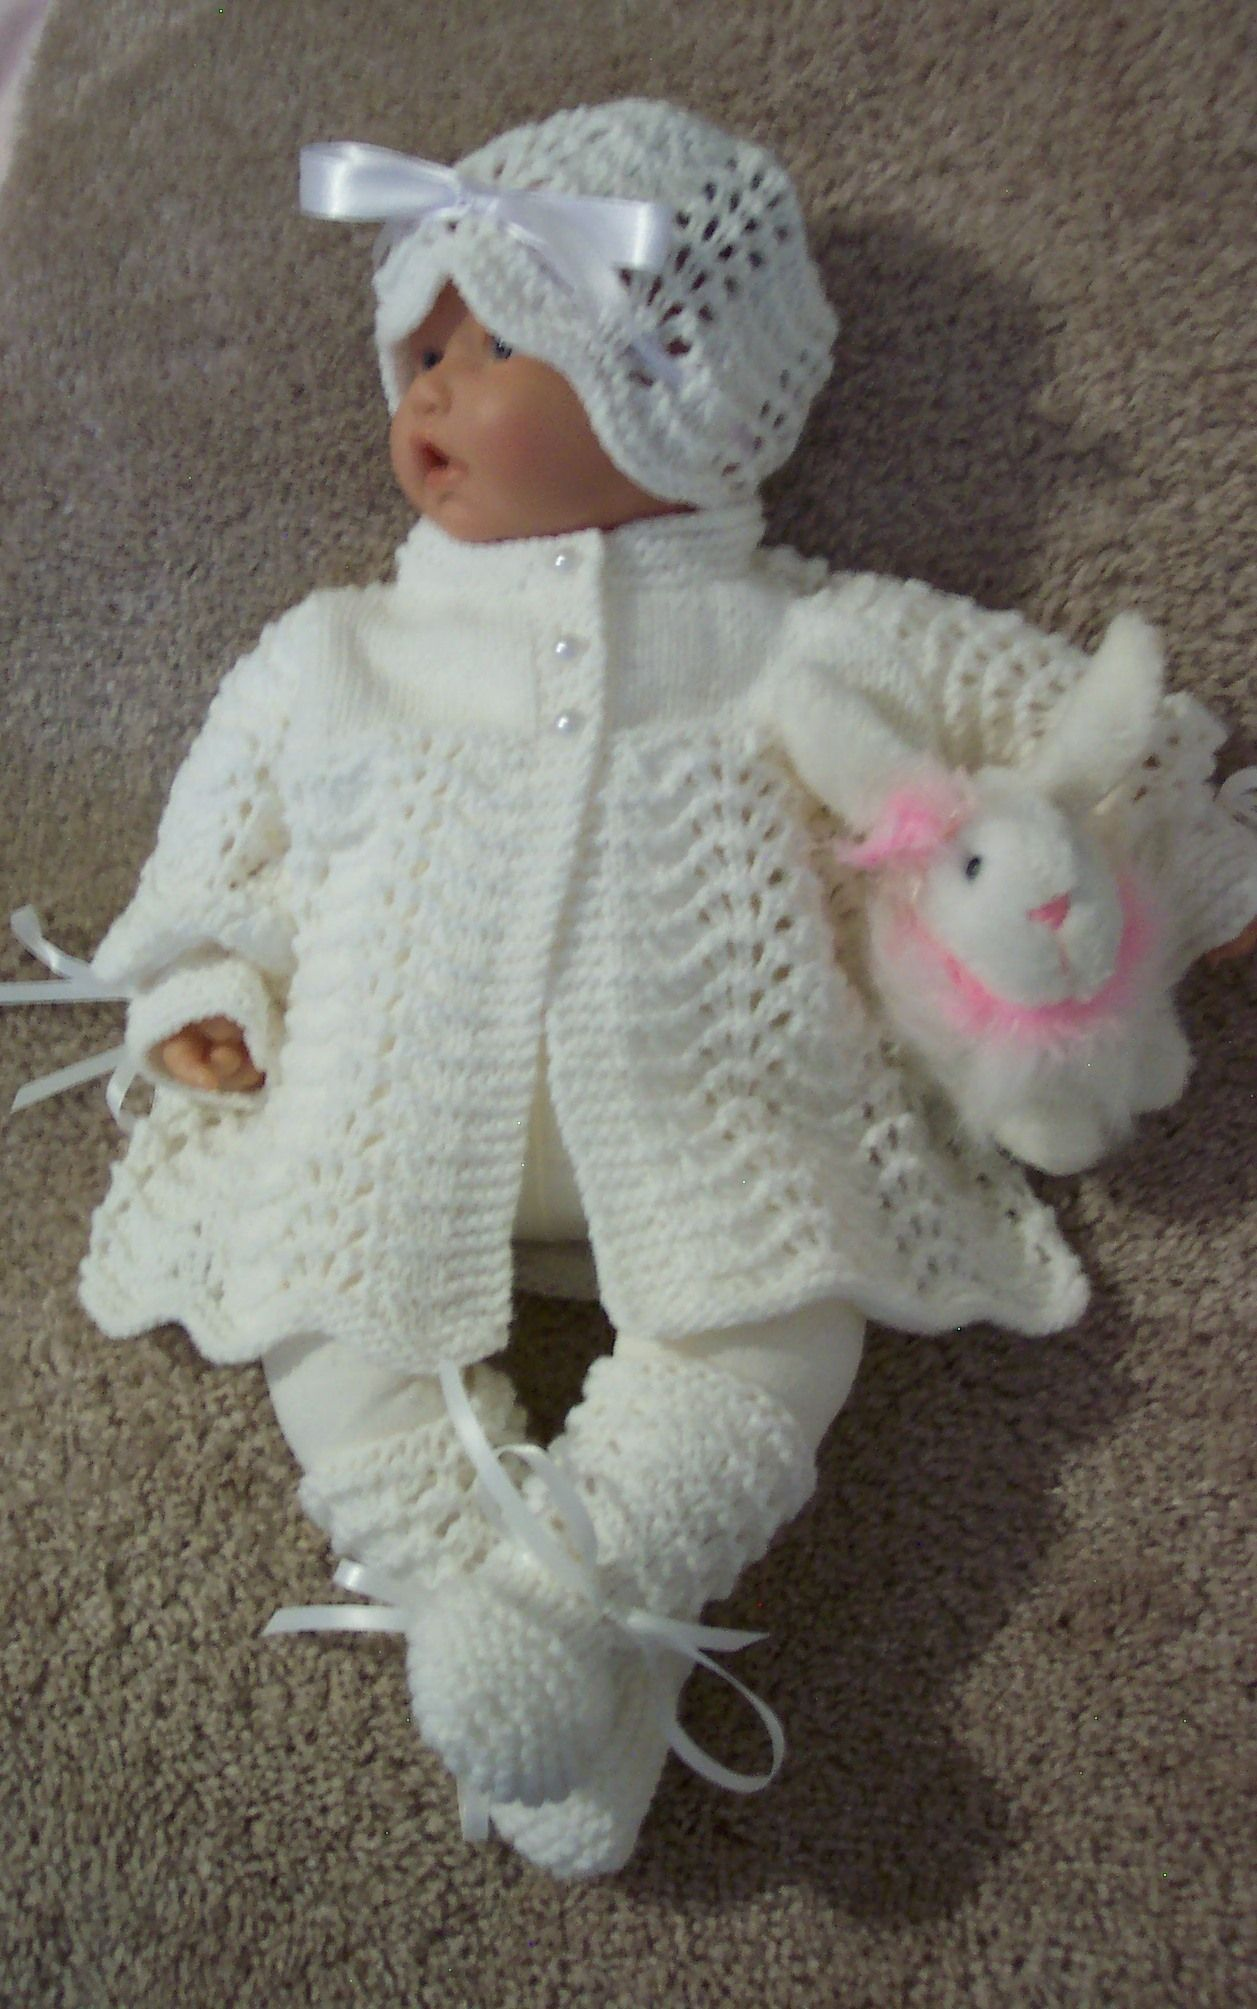 115da99e0 Handmade white baby sweater hat   booties layette set. Hand knitted ...